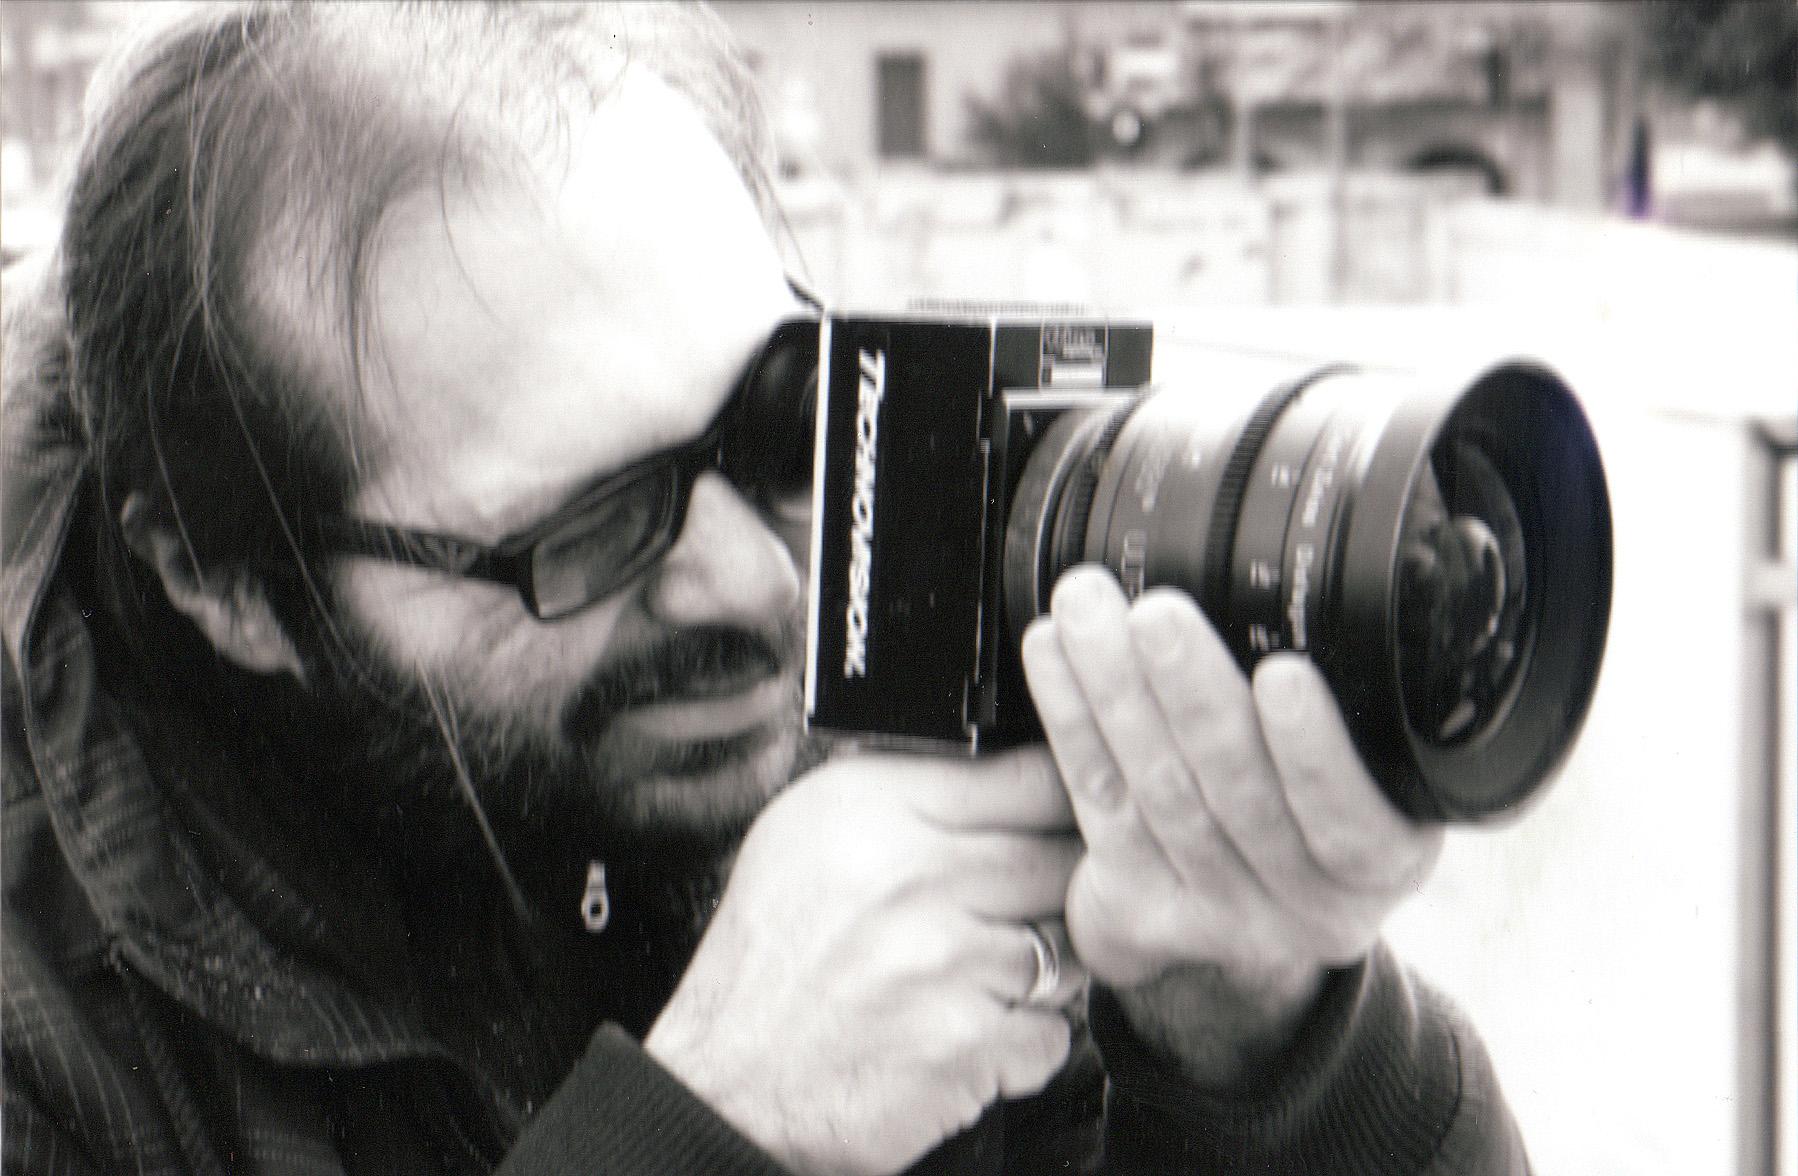 Il regista Carlo Hintermann